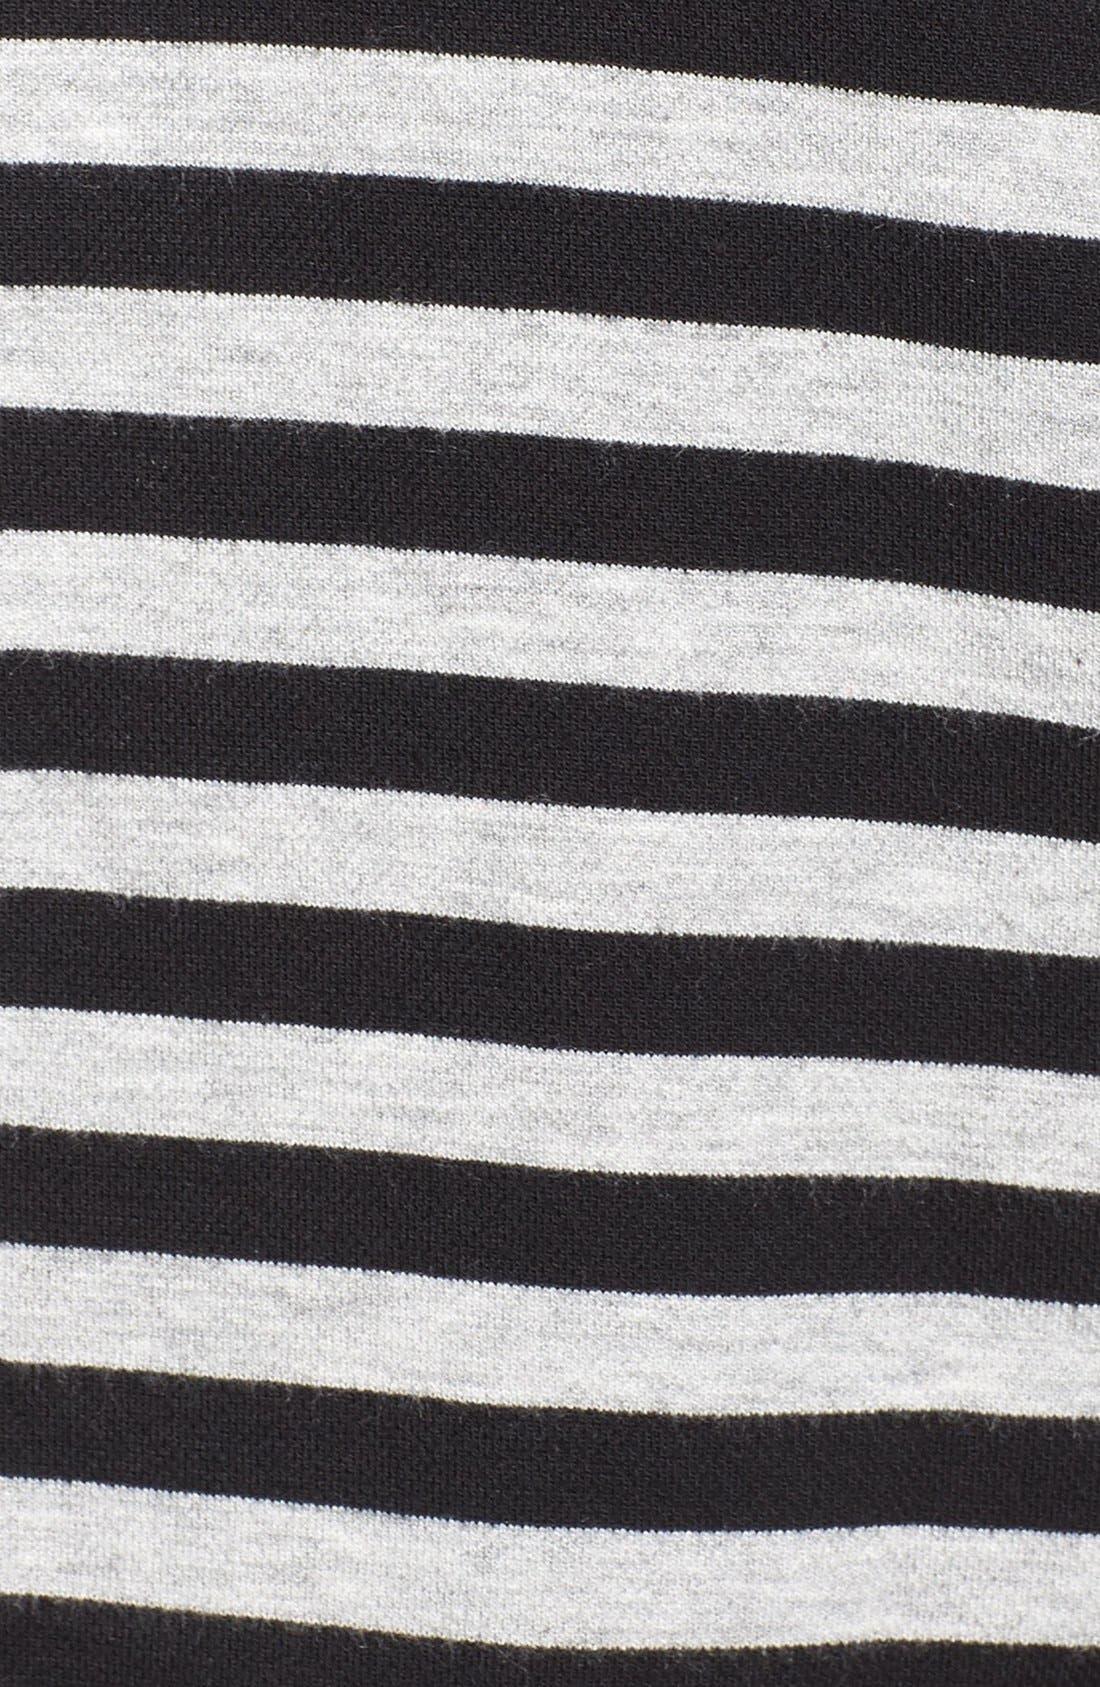 'Veronicka' Stripe Knit Open Front Jacket,                             Alternate thumbnail 5, color,                             BLACK/ HEATHER GREY STRIPE